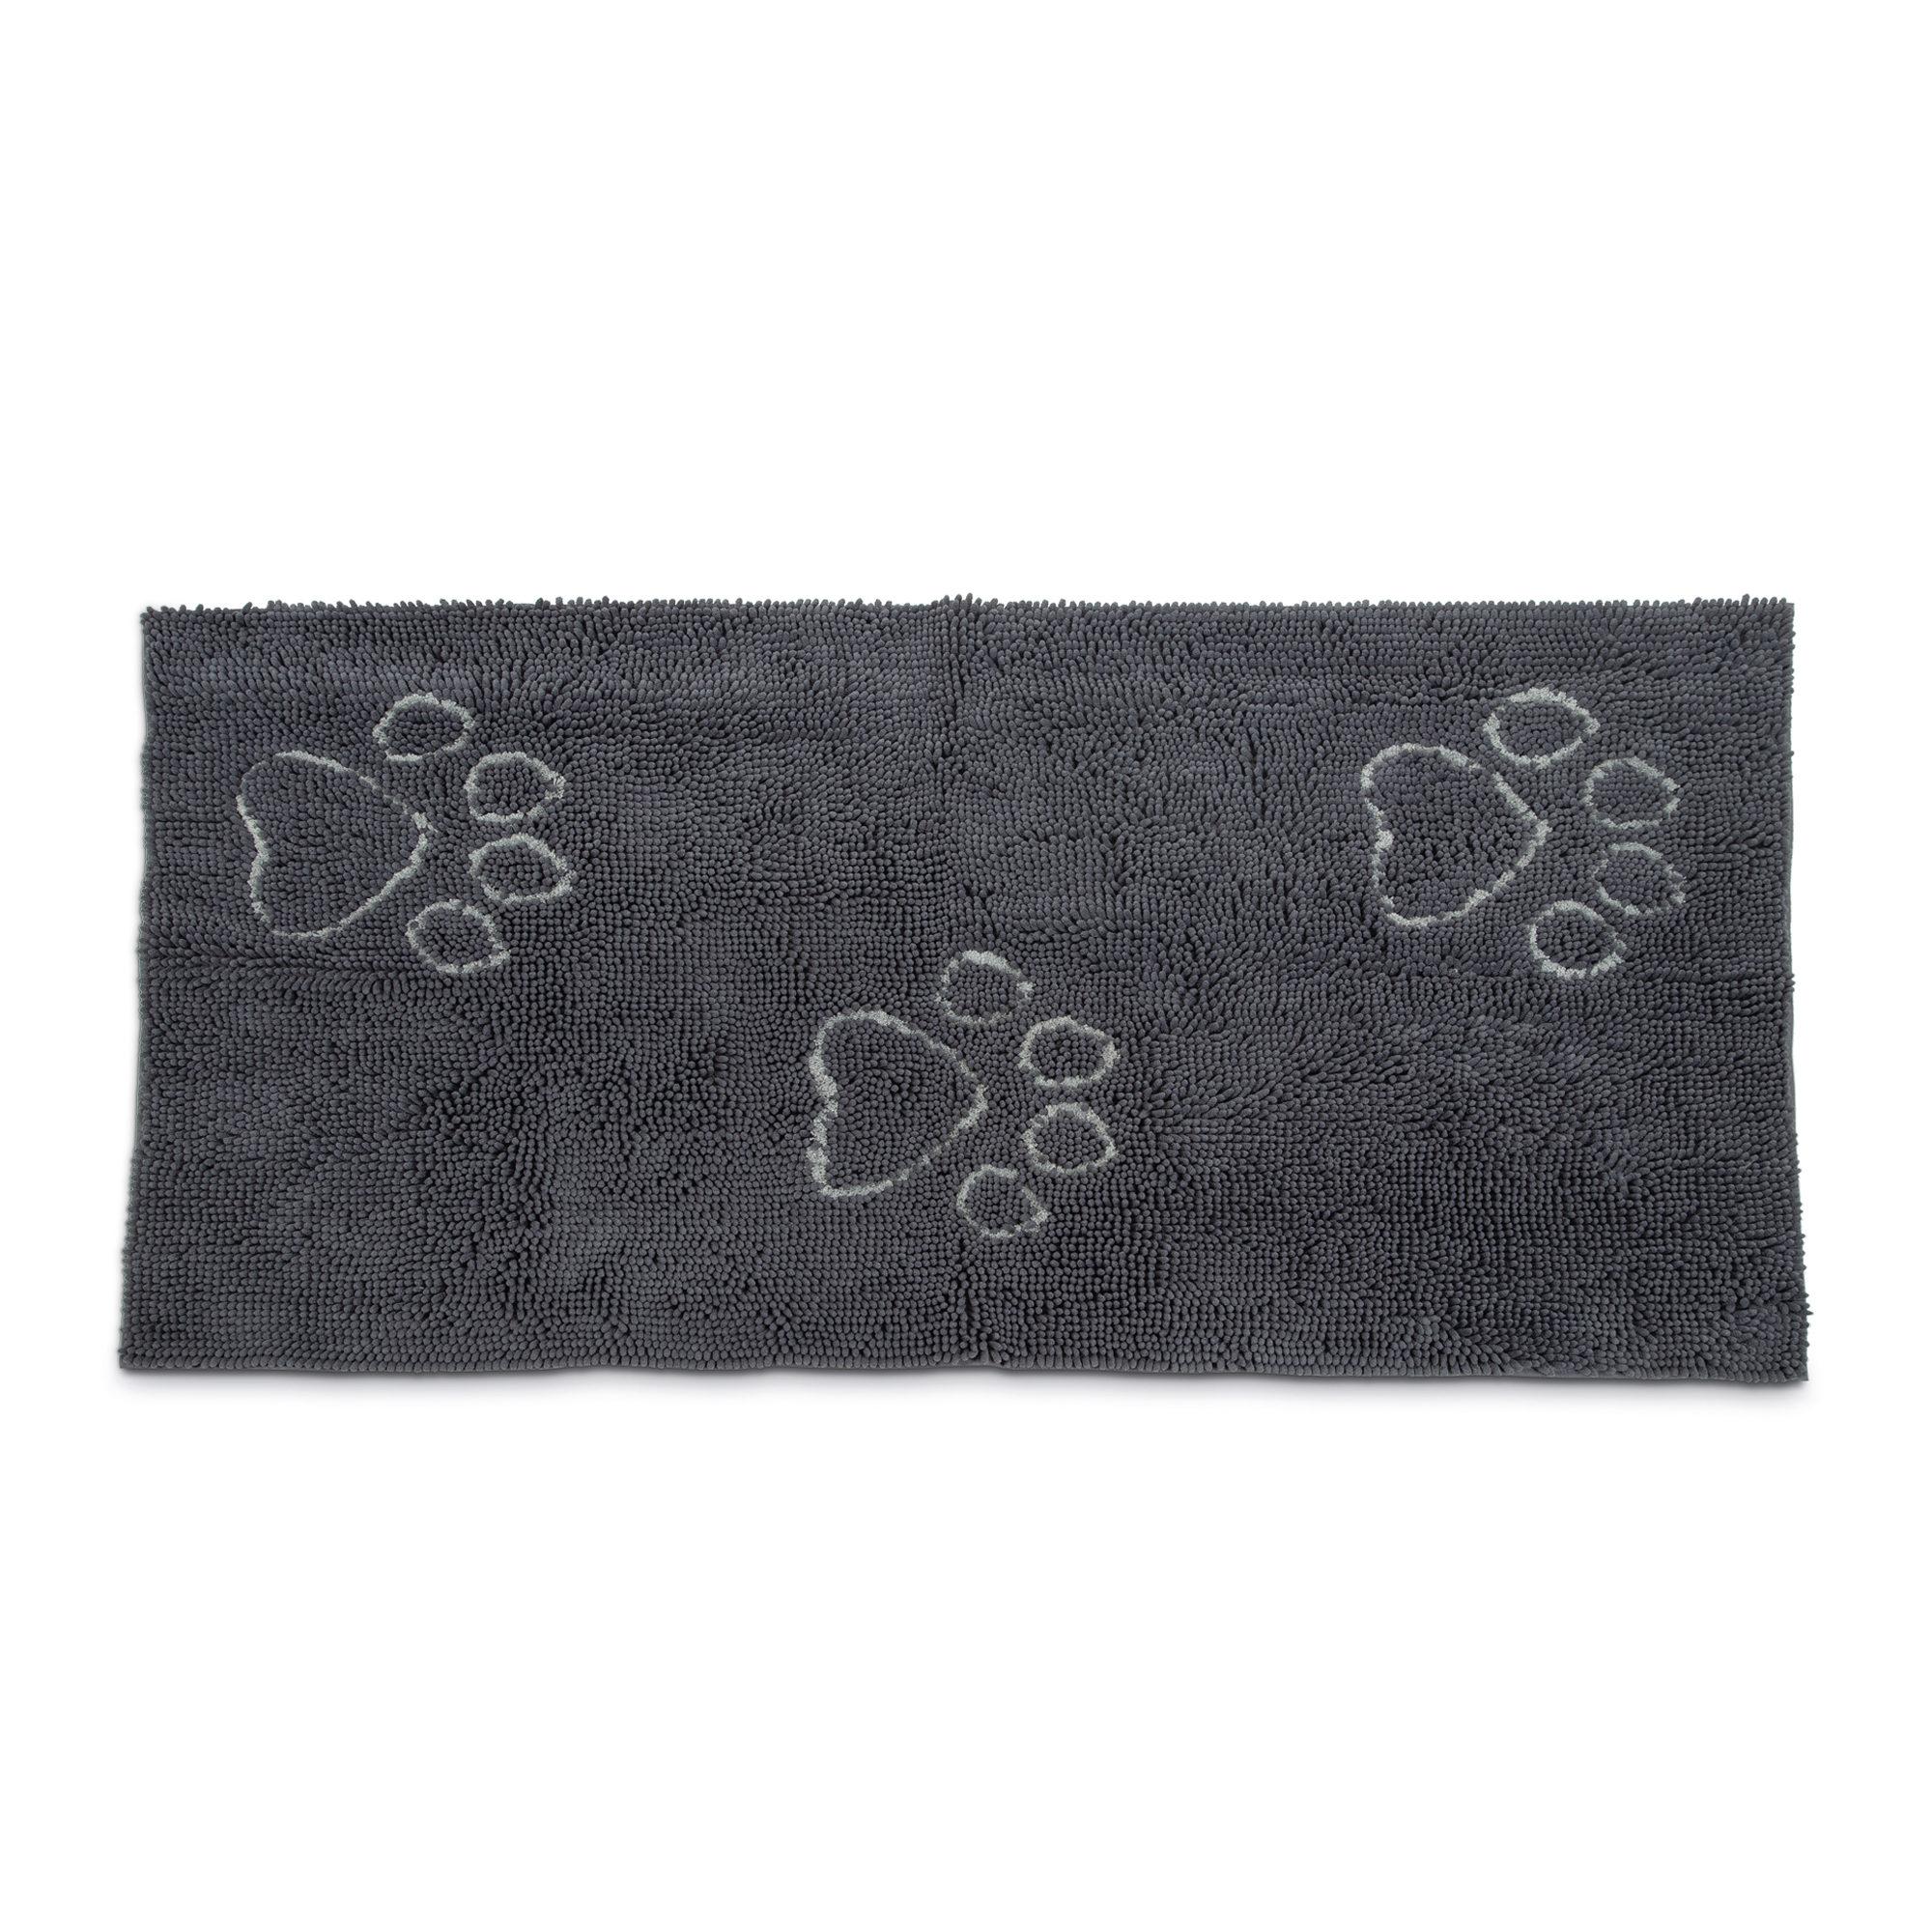 Dog Gone Smart Dirty Dog Doormat Runner - Gris